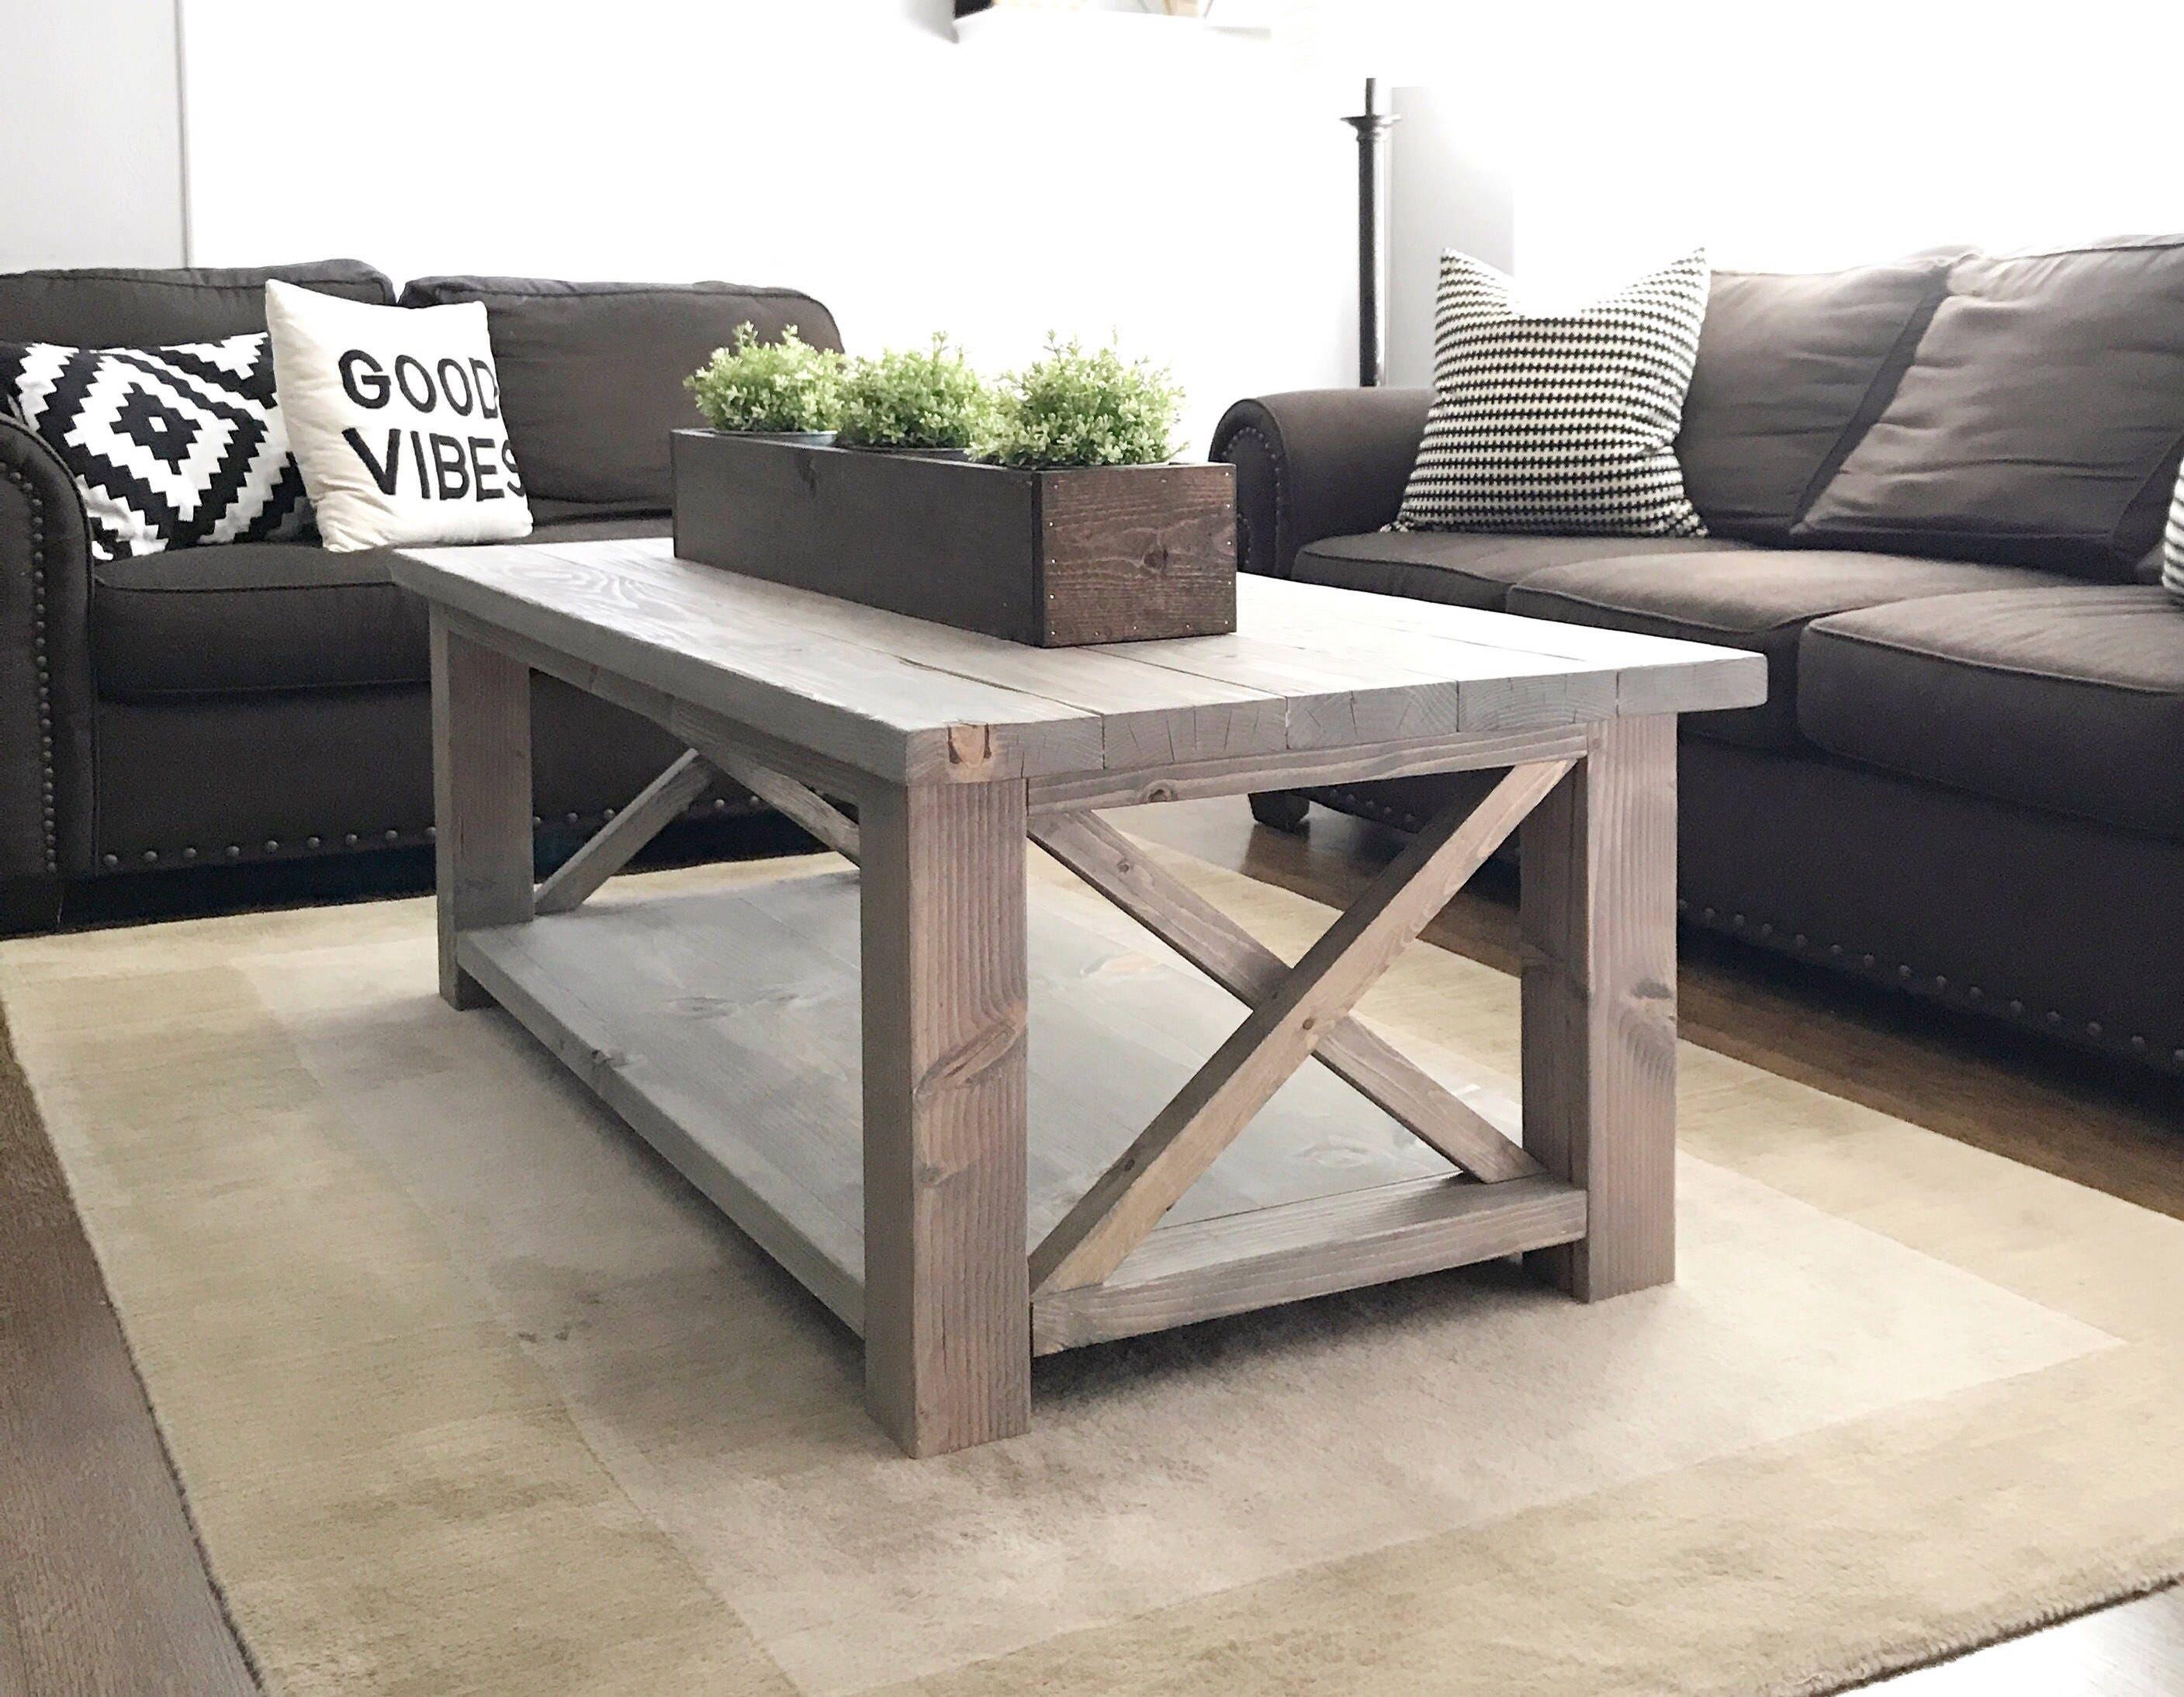 rustic coffee tablefarmhouse coffee table. Black Bedroom Furniture Sets. Home Design Ideas